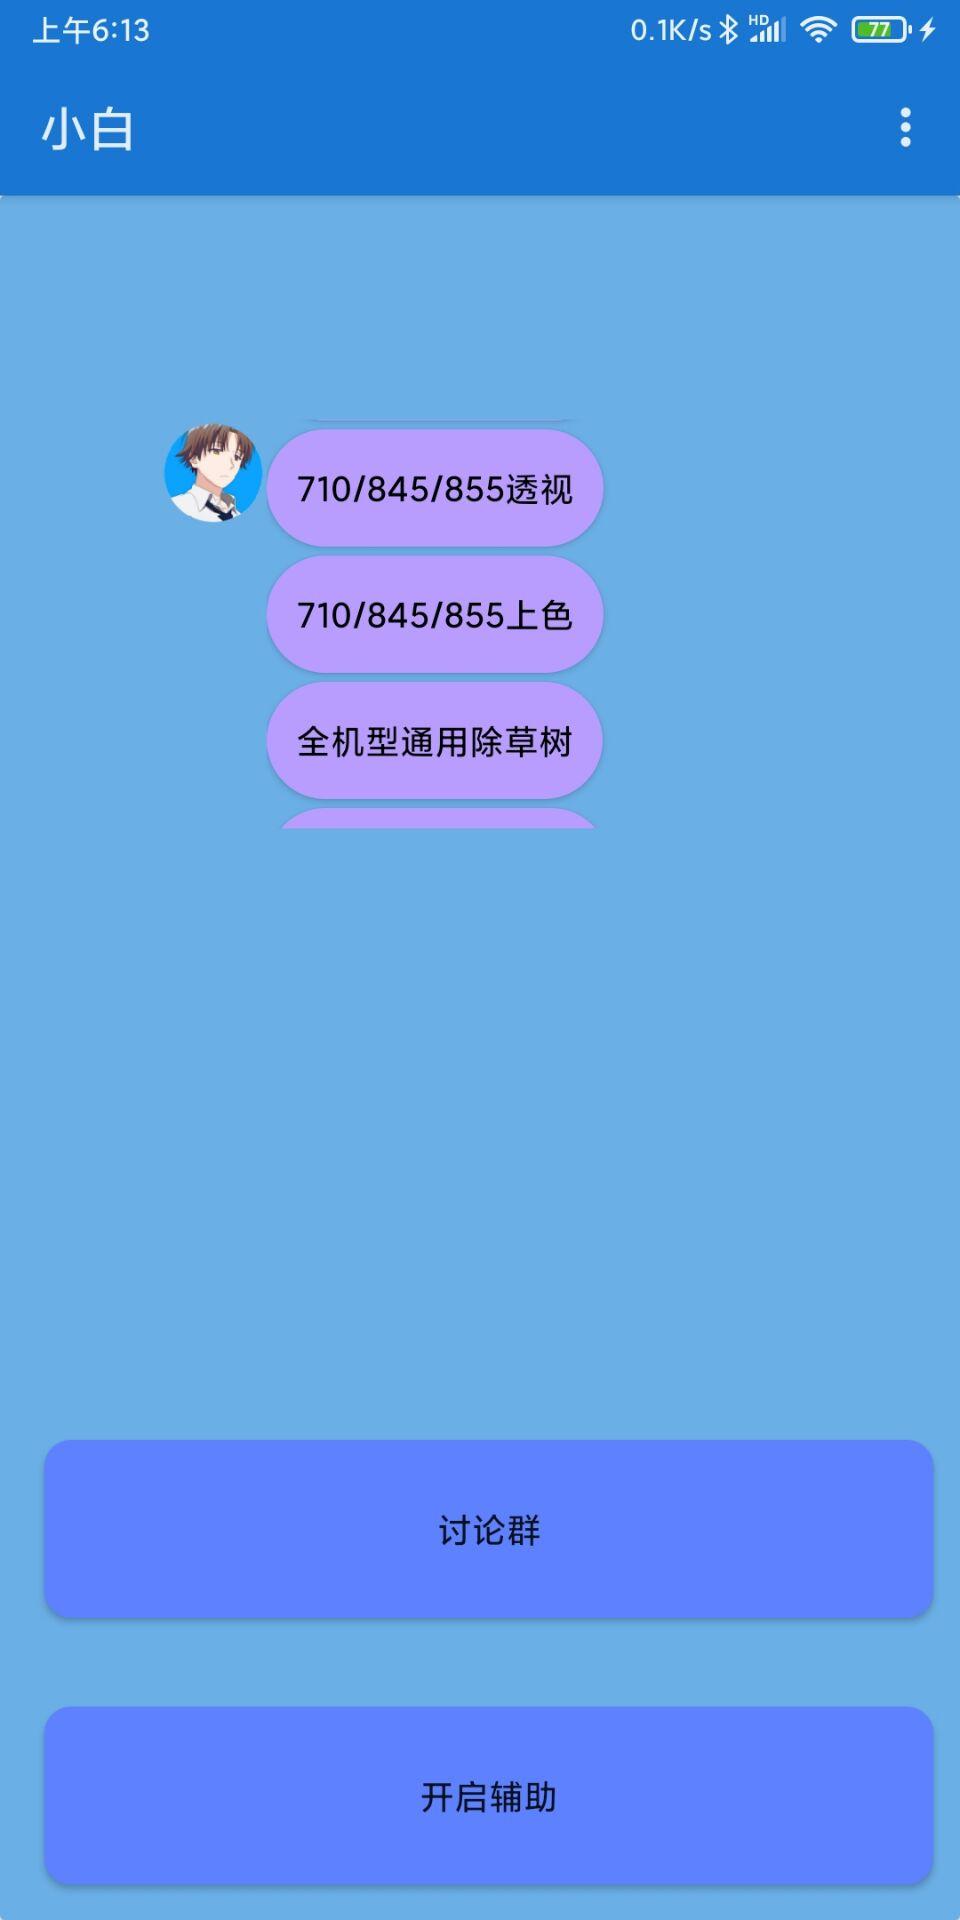 b6cef66b5f6dd2daa2bb451f570ac8d12.jpg